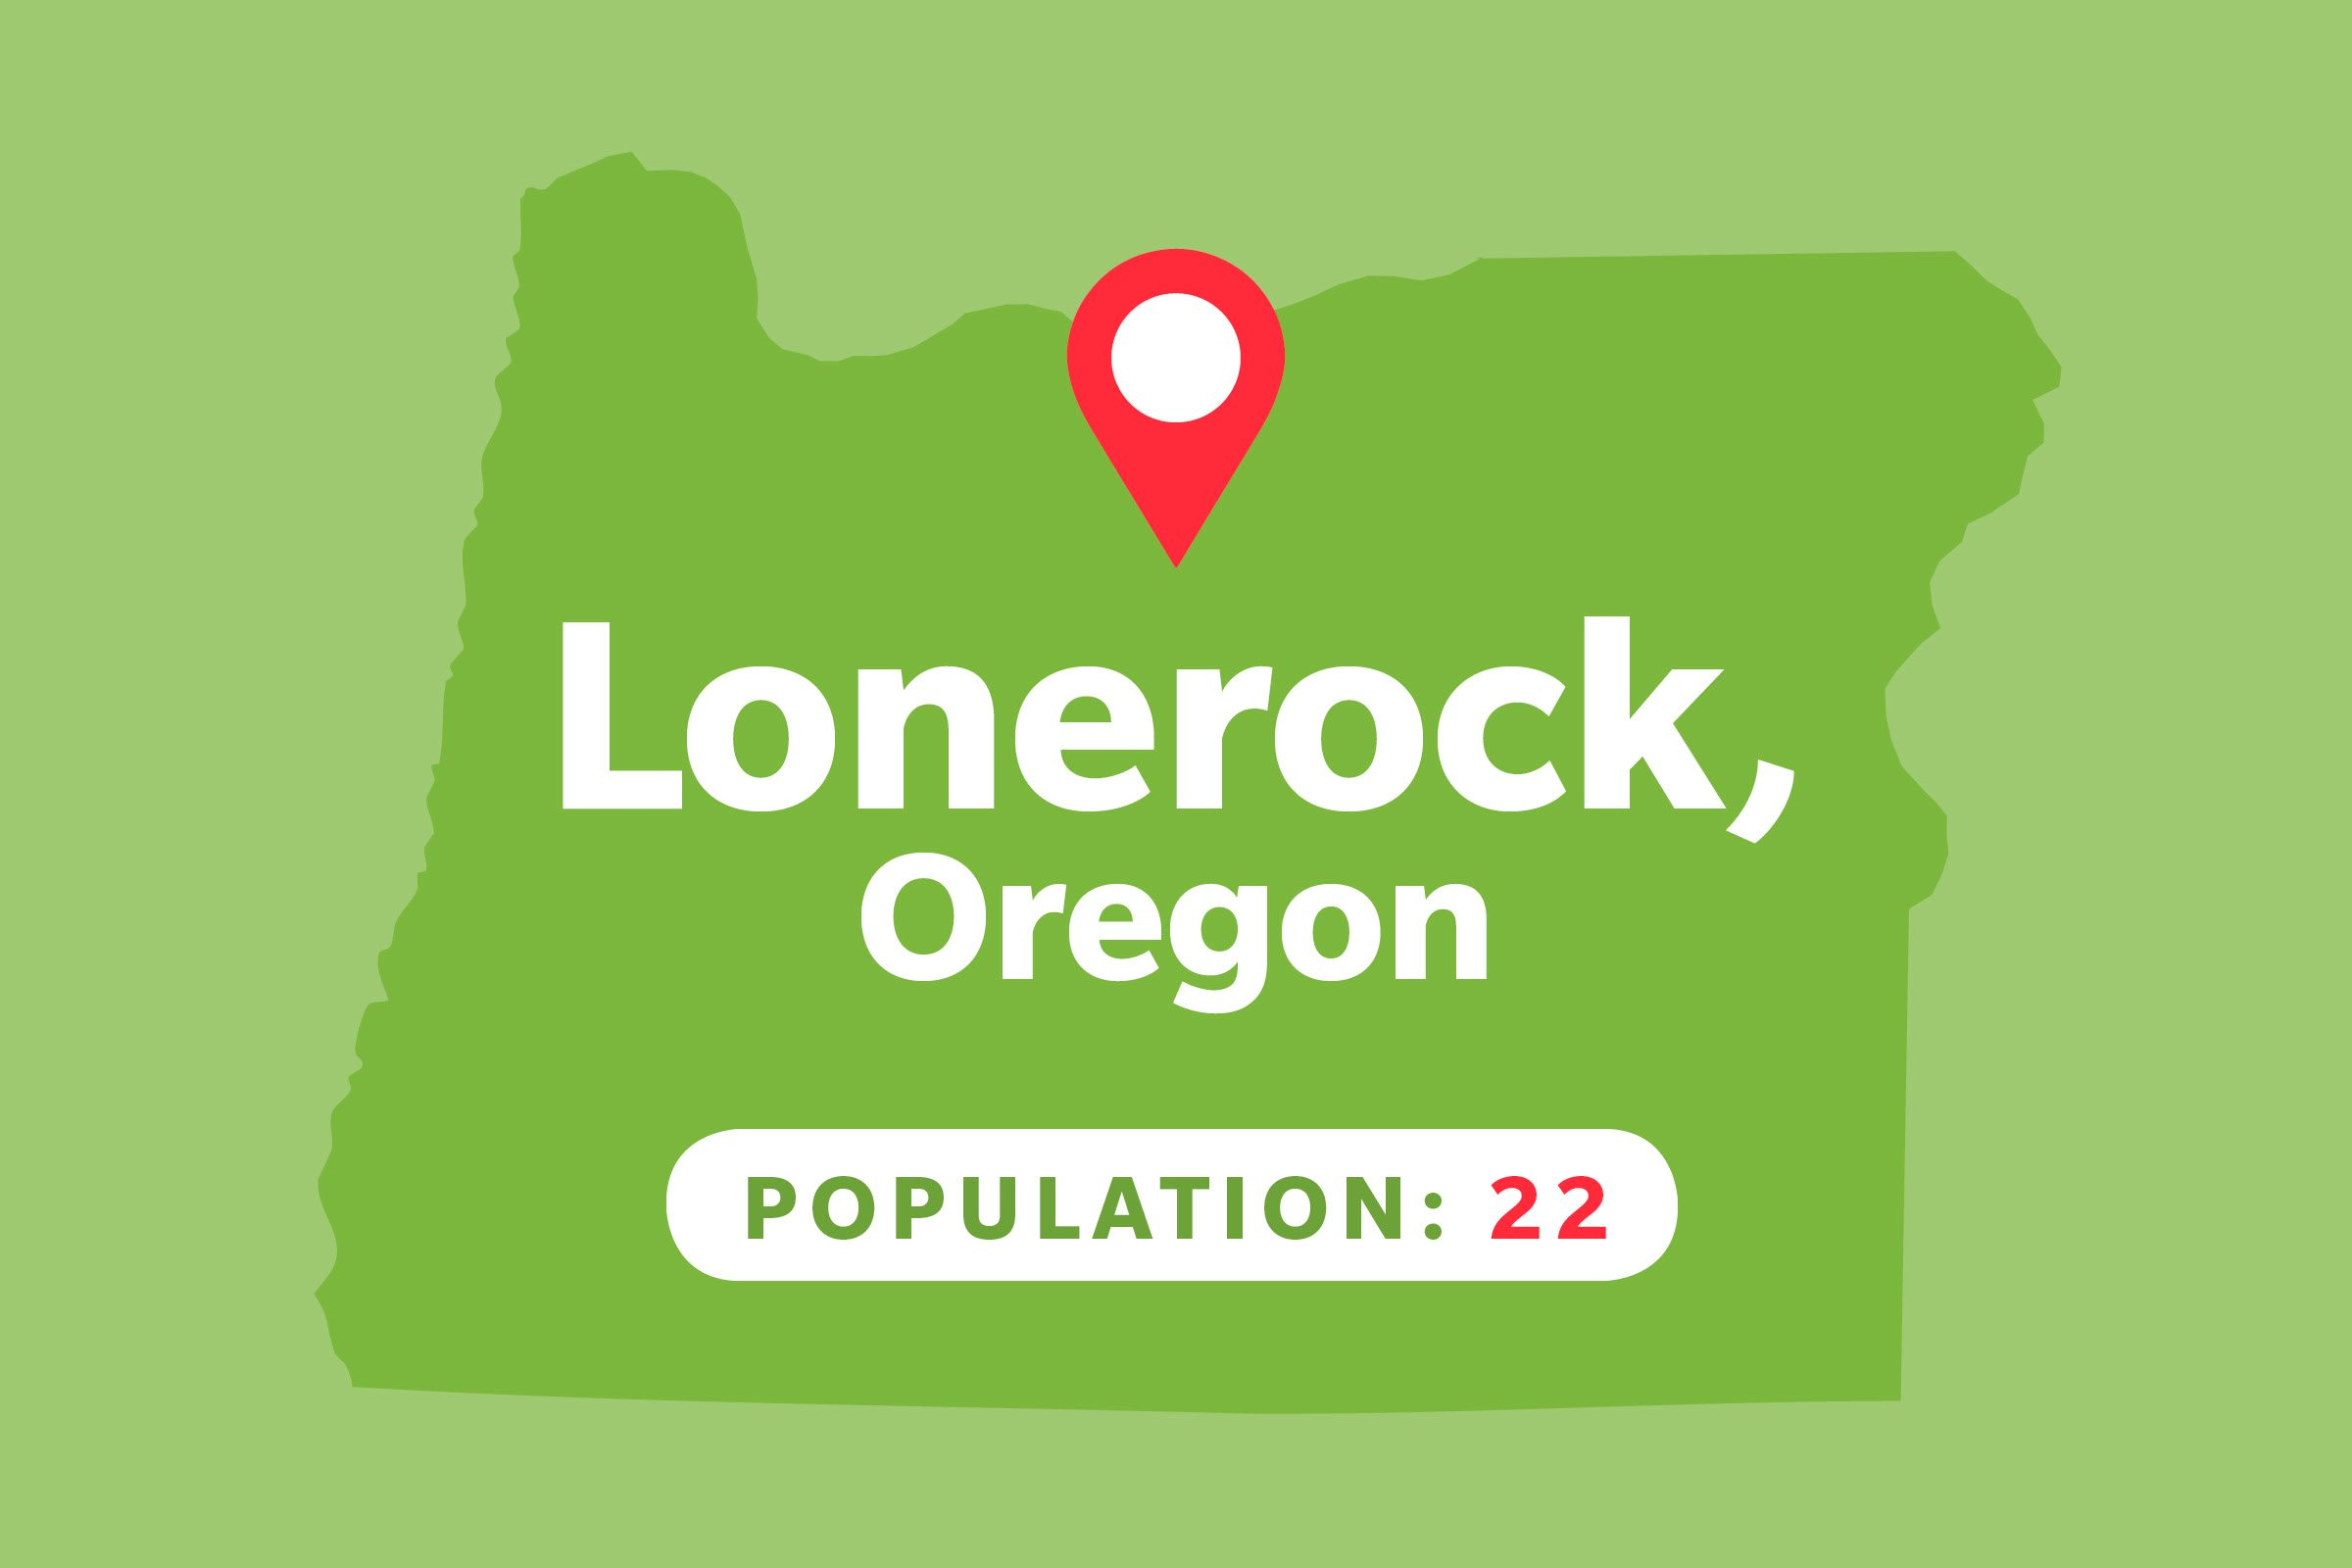 Lonerock, Oregon